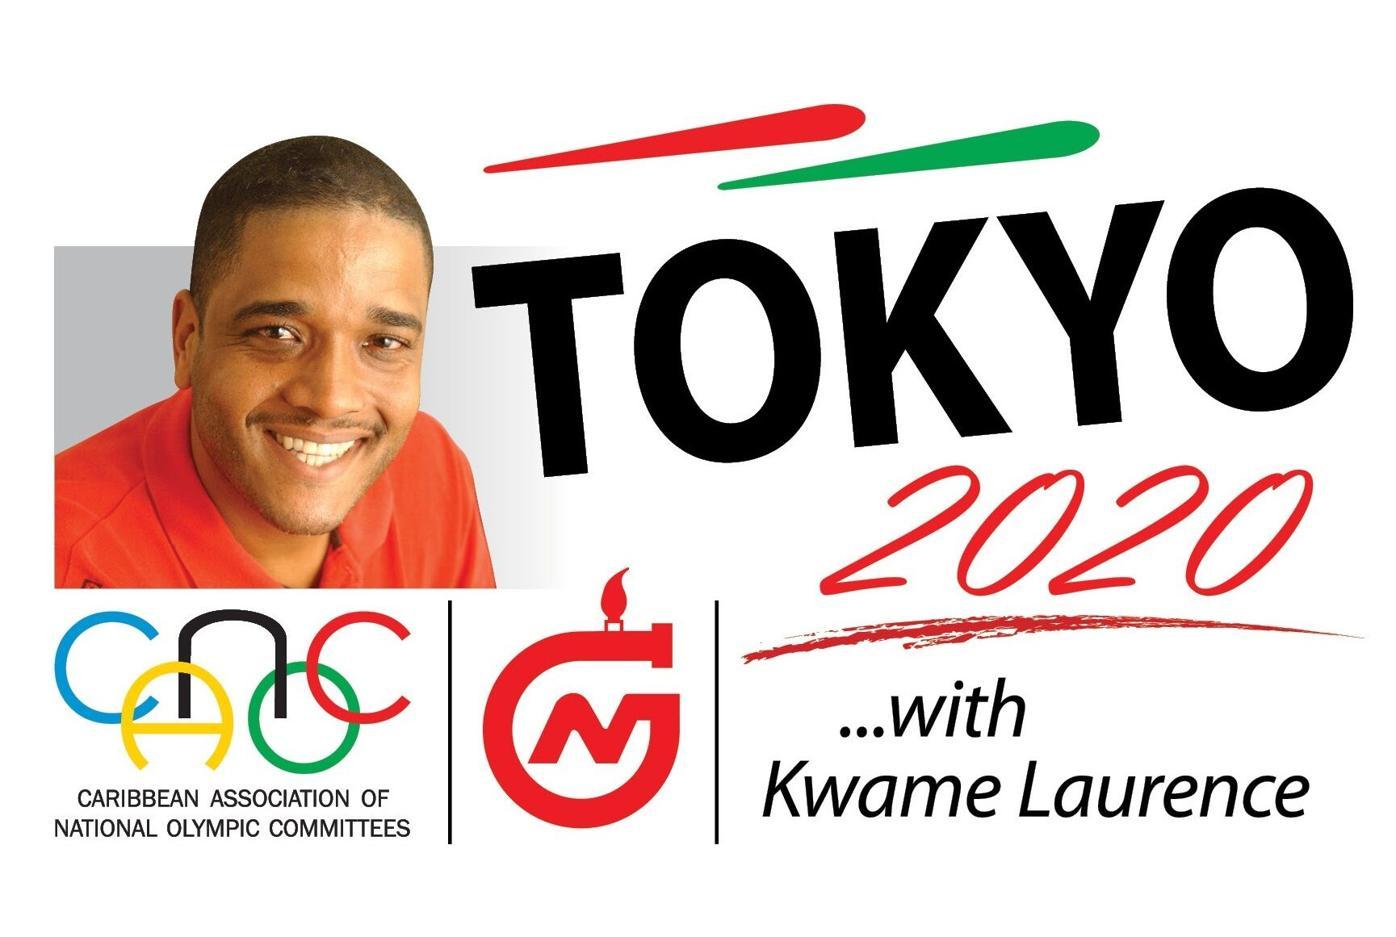 TOKYO 2020 CANOC NGC LOGO